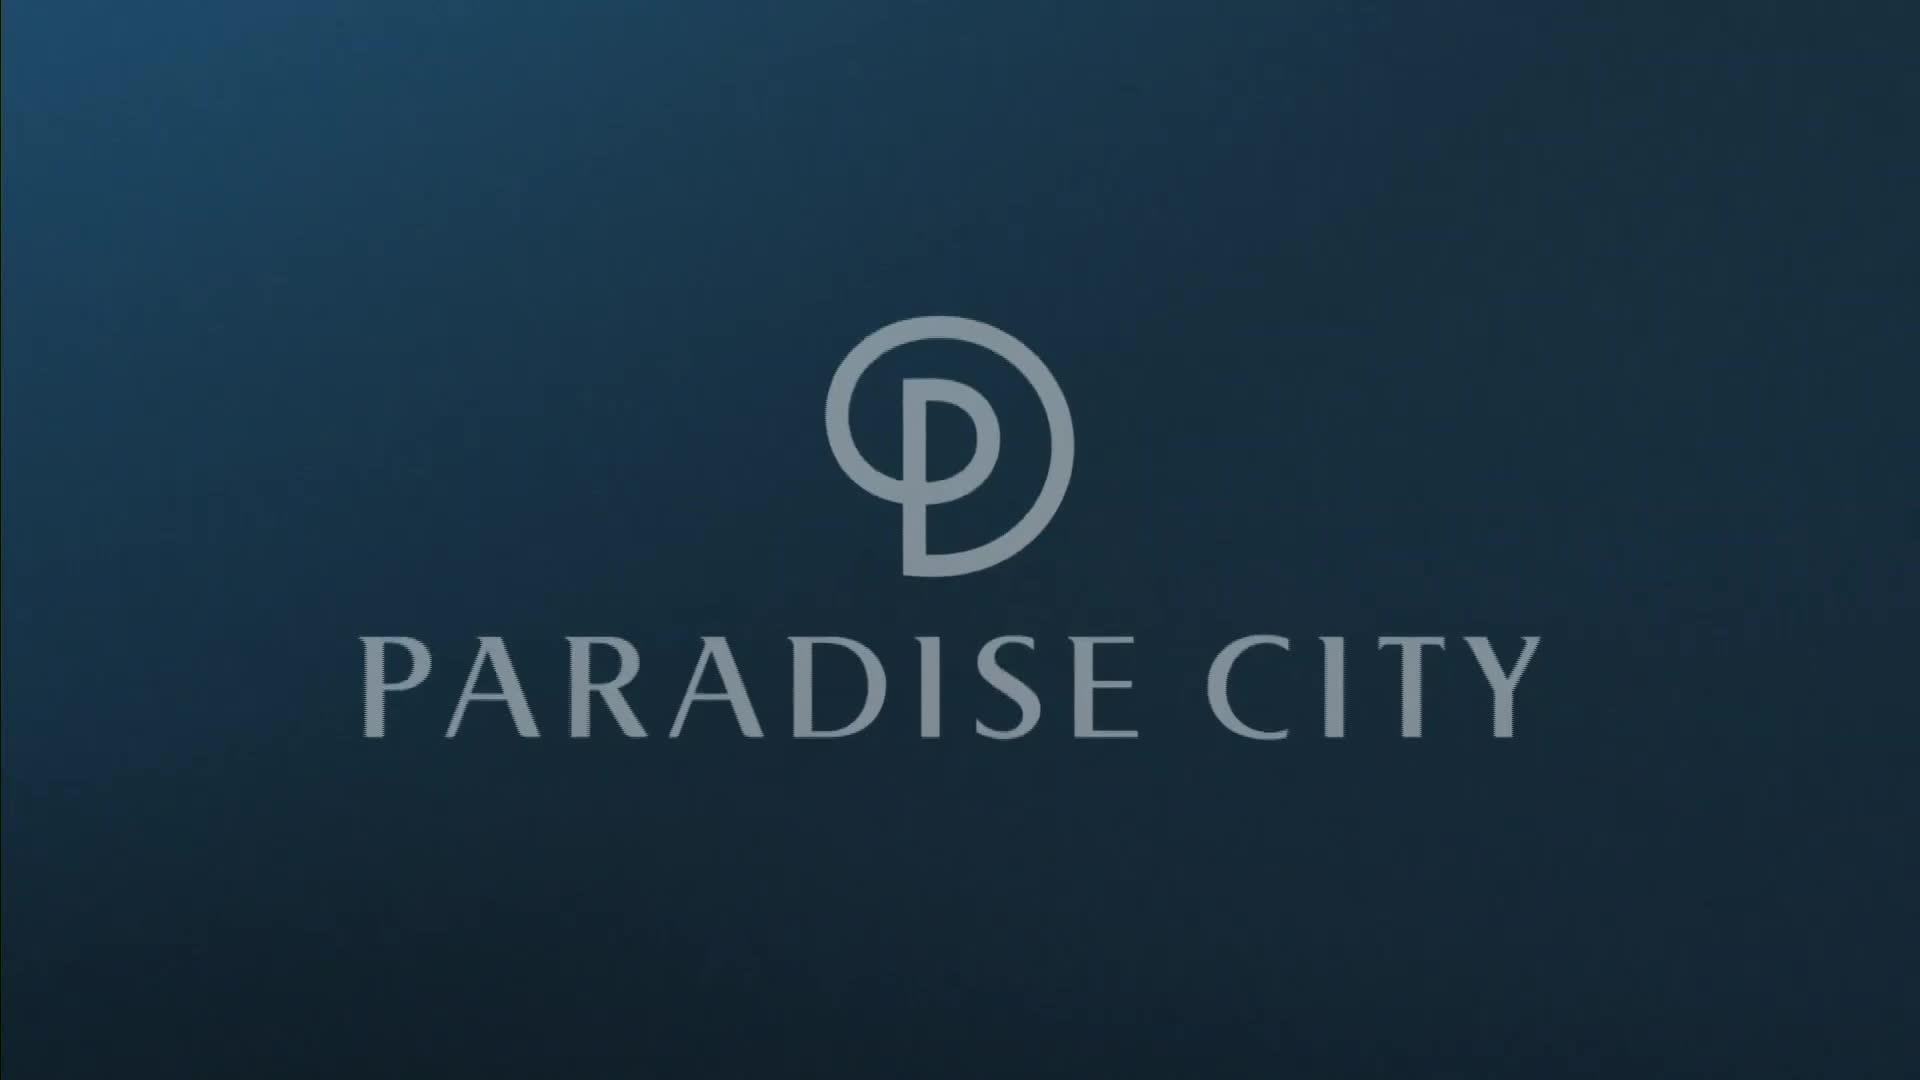 Paradise City Entertaining Moment at the 2021 Diamond Resorts Tournament of Champions